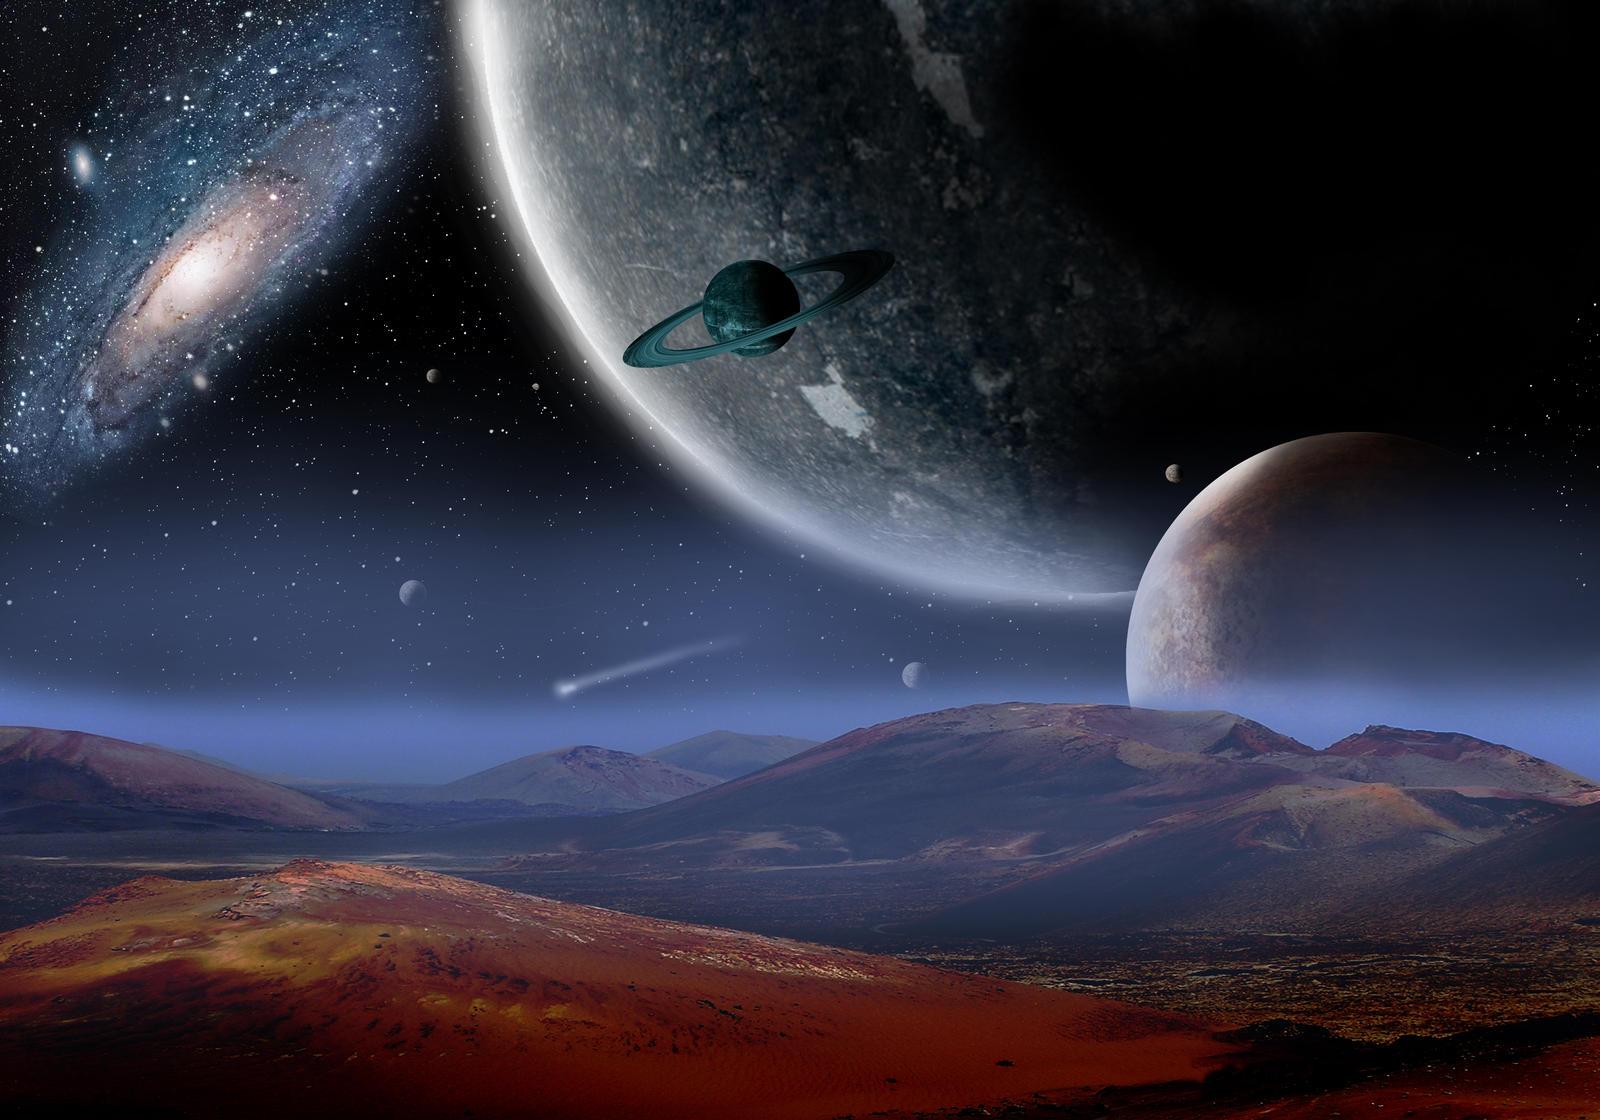 rain on different planets - photo #13